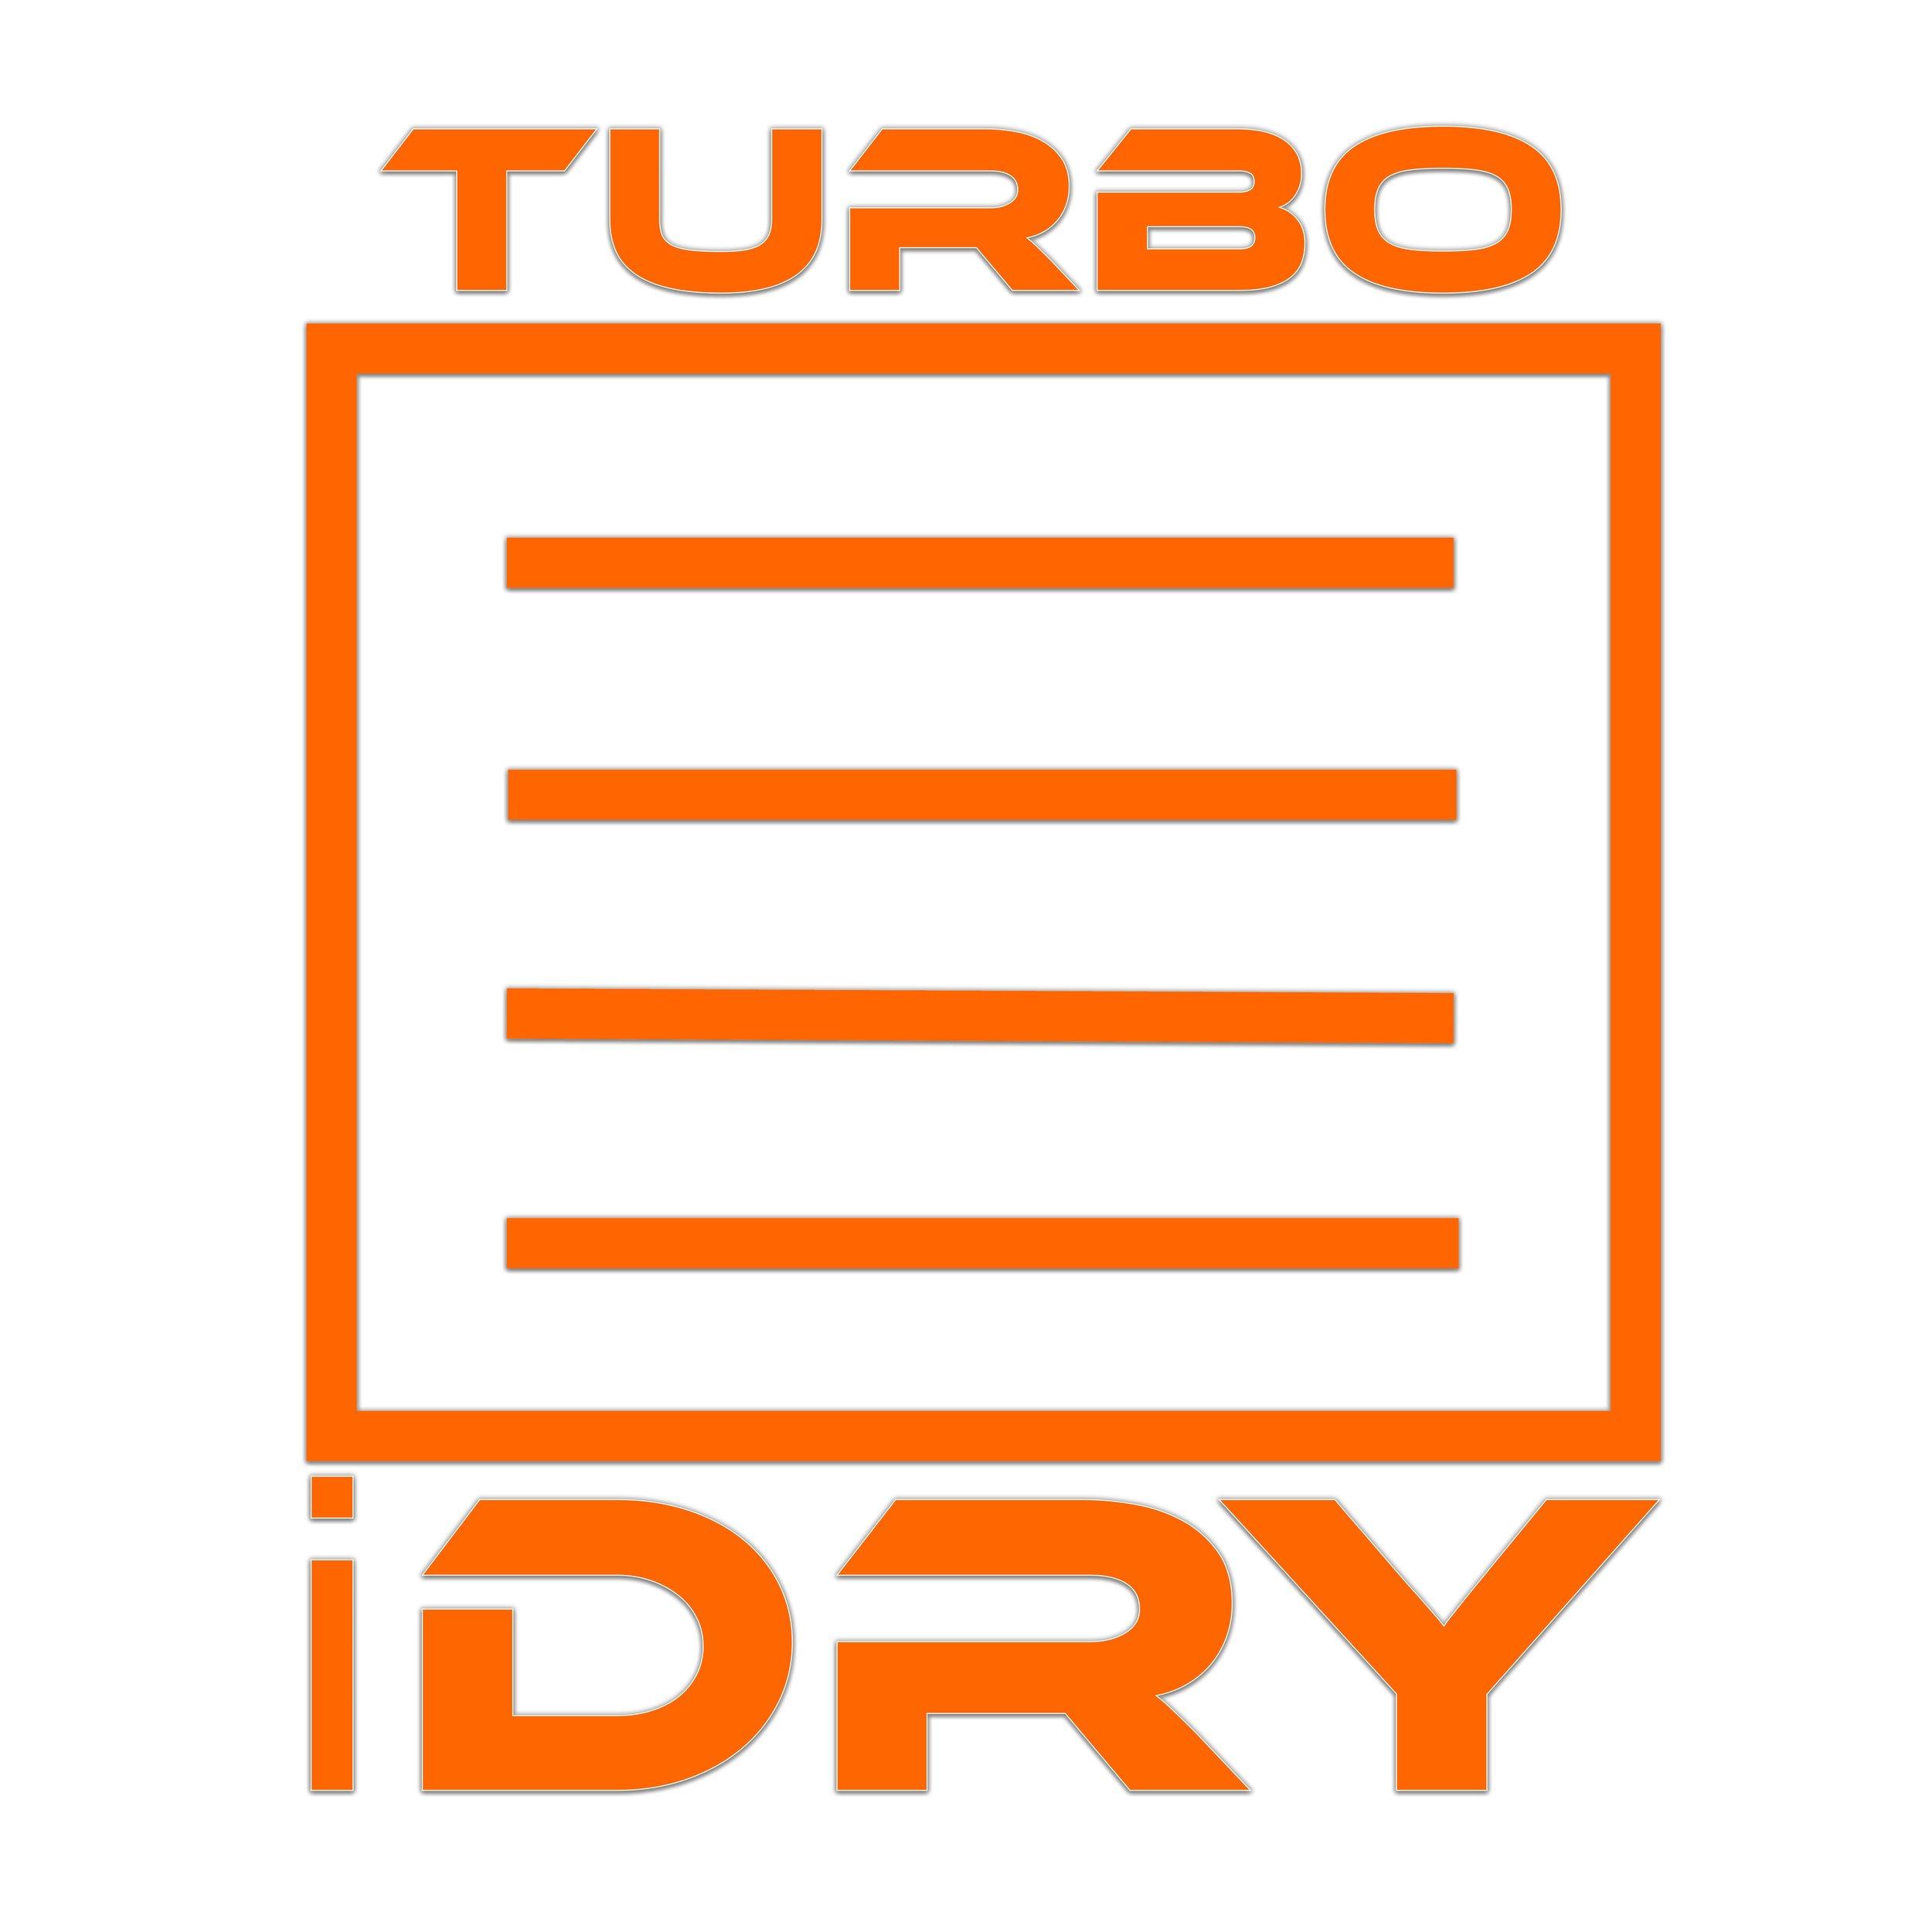 idry turbo logo.jpg